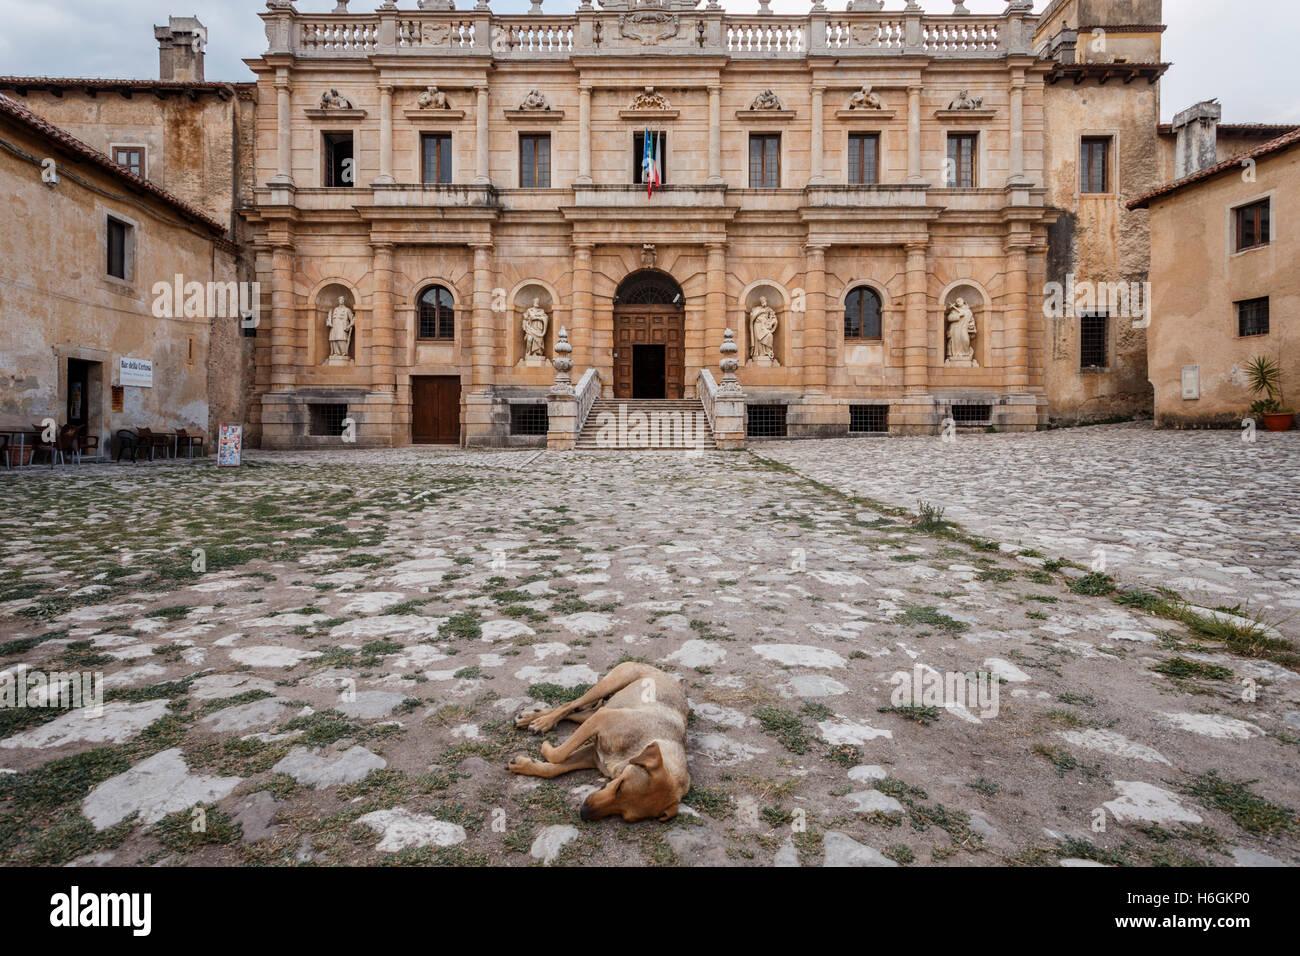 Front entrance of the Certosa di San Lorenzo charterhouse in Padula, Capania, Italy. Stock Photo